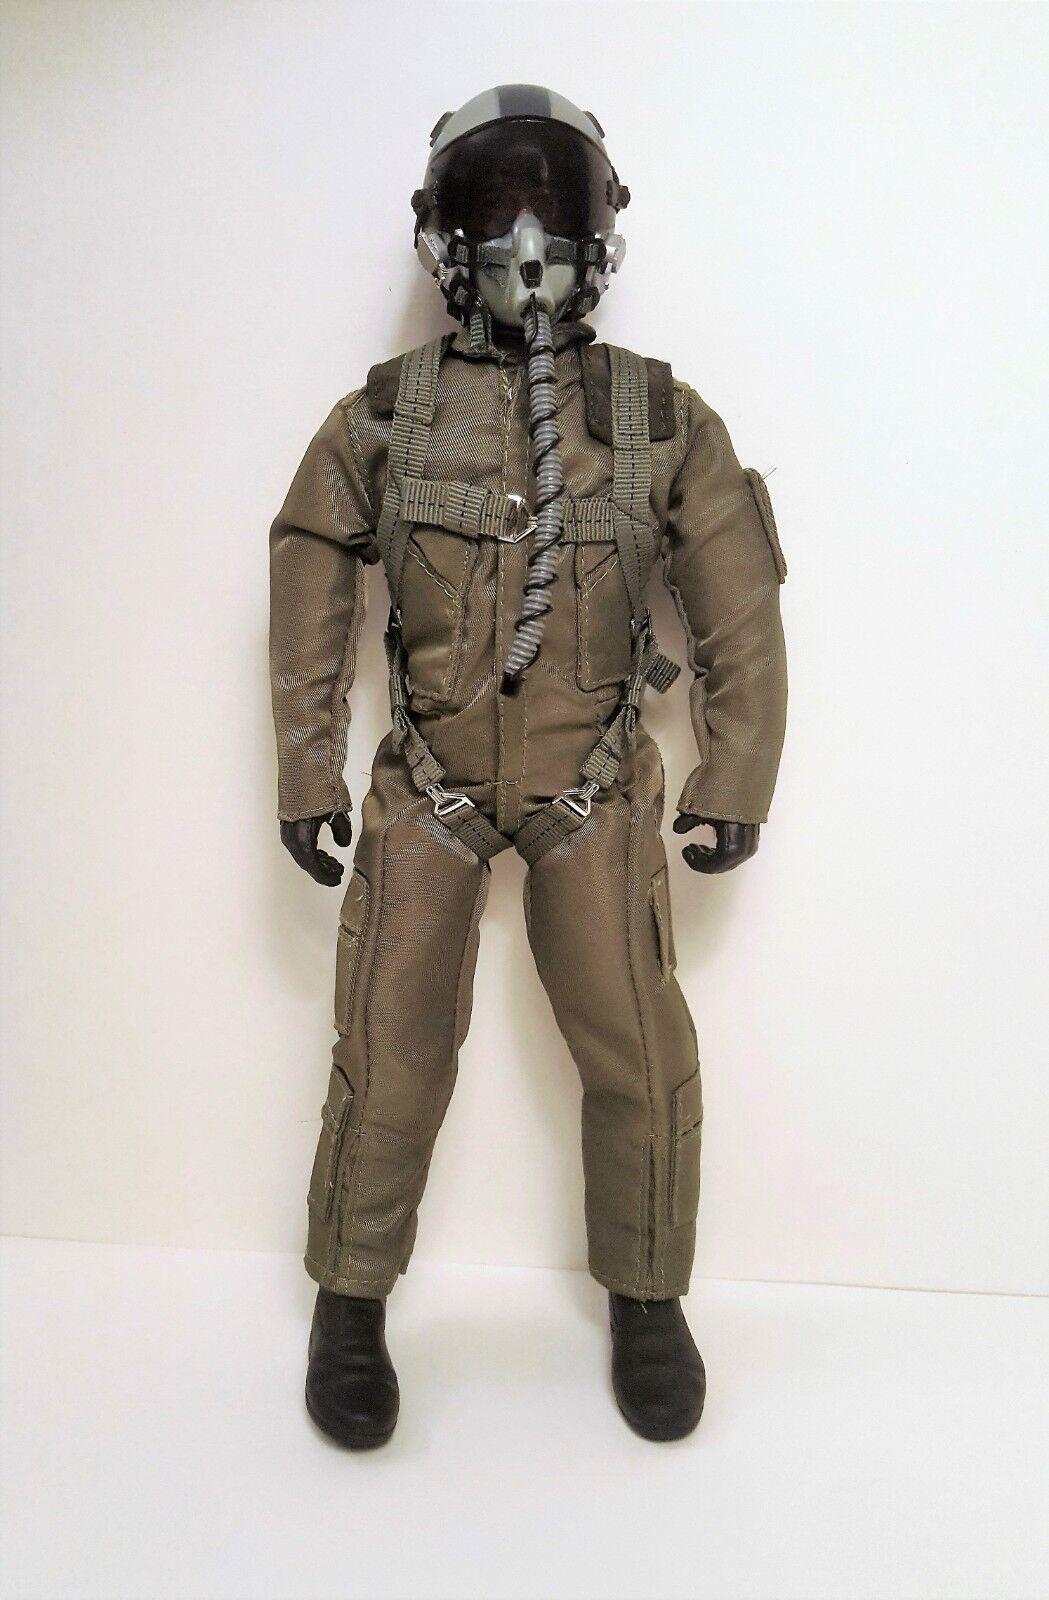 1/4.5  1/4 escala US Air Force/Azul Marino piloto figura con cabeza de accionamiento servo